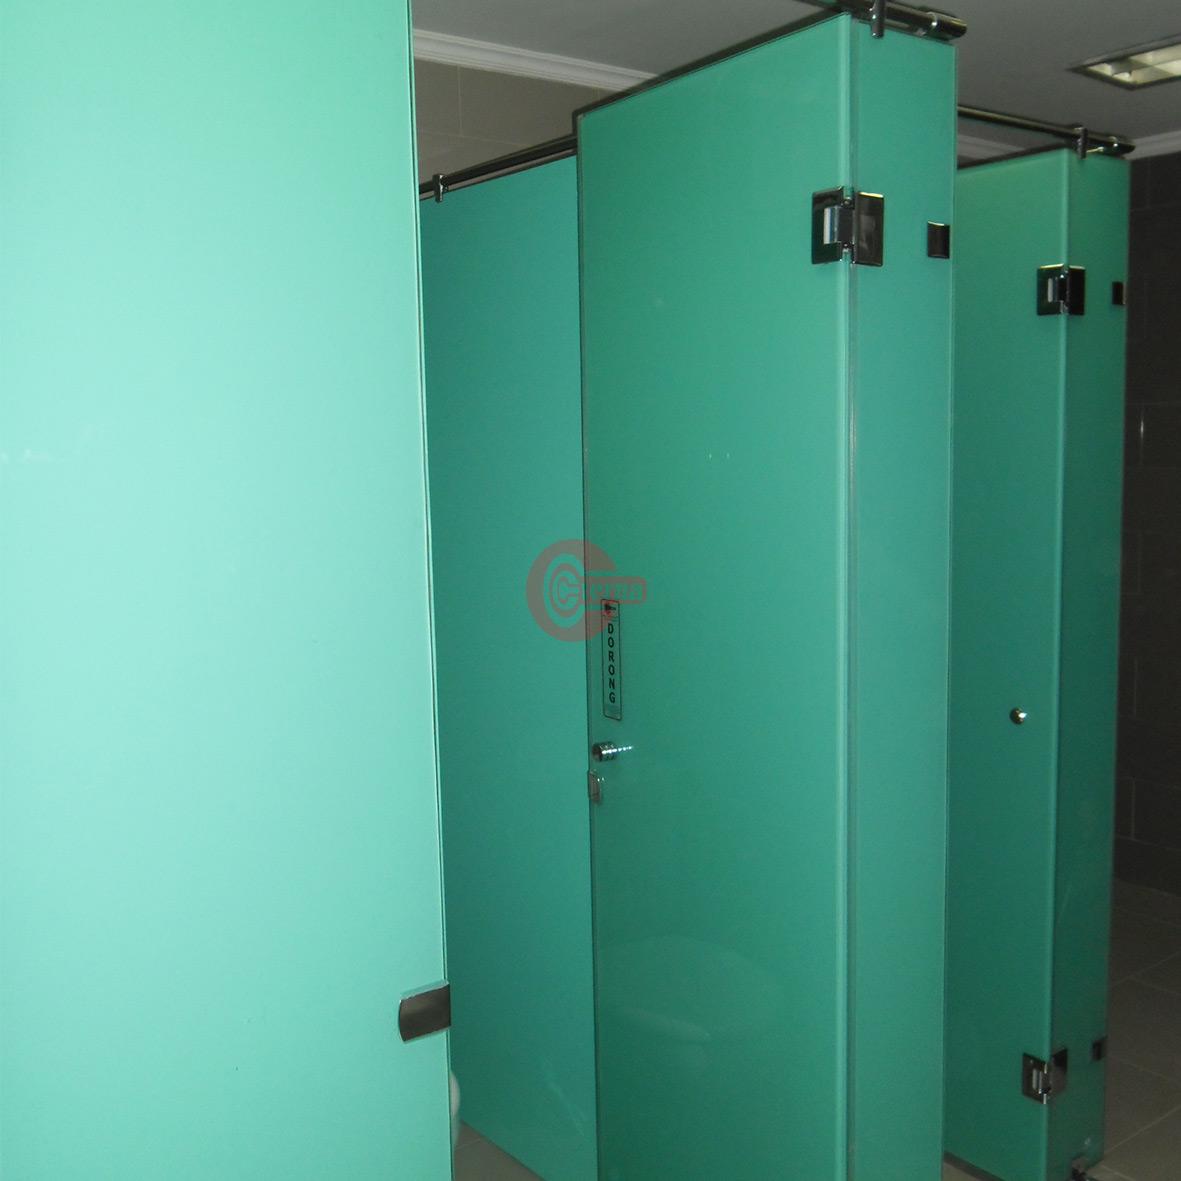 cubicle toilet semarang